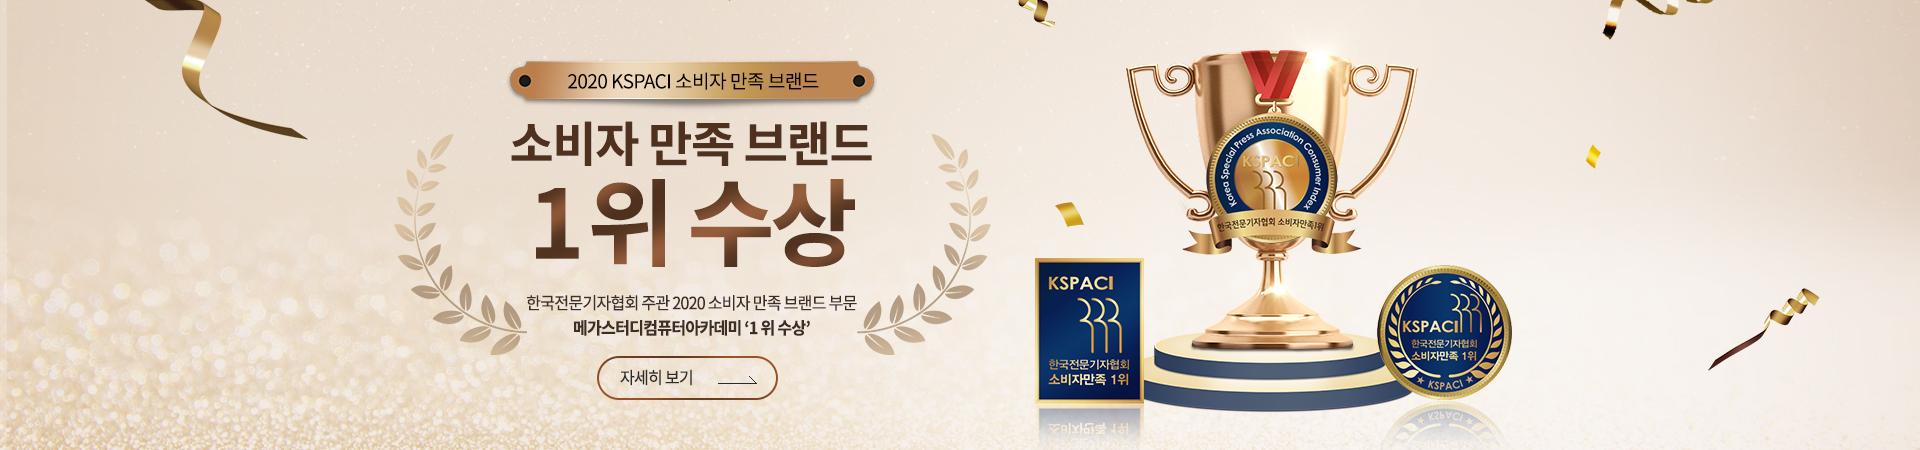 2020 KSPACI 소비자 만족도 브랜드 1위 수상